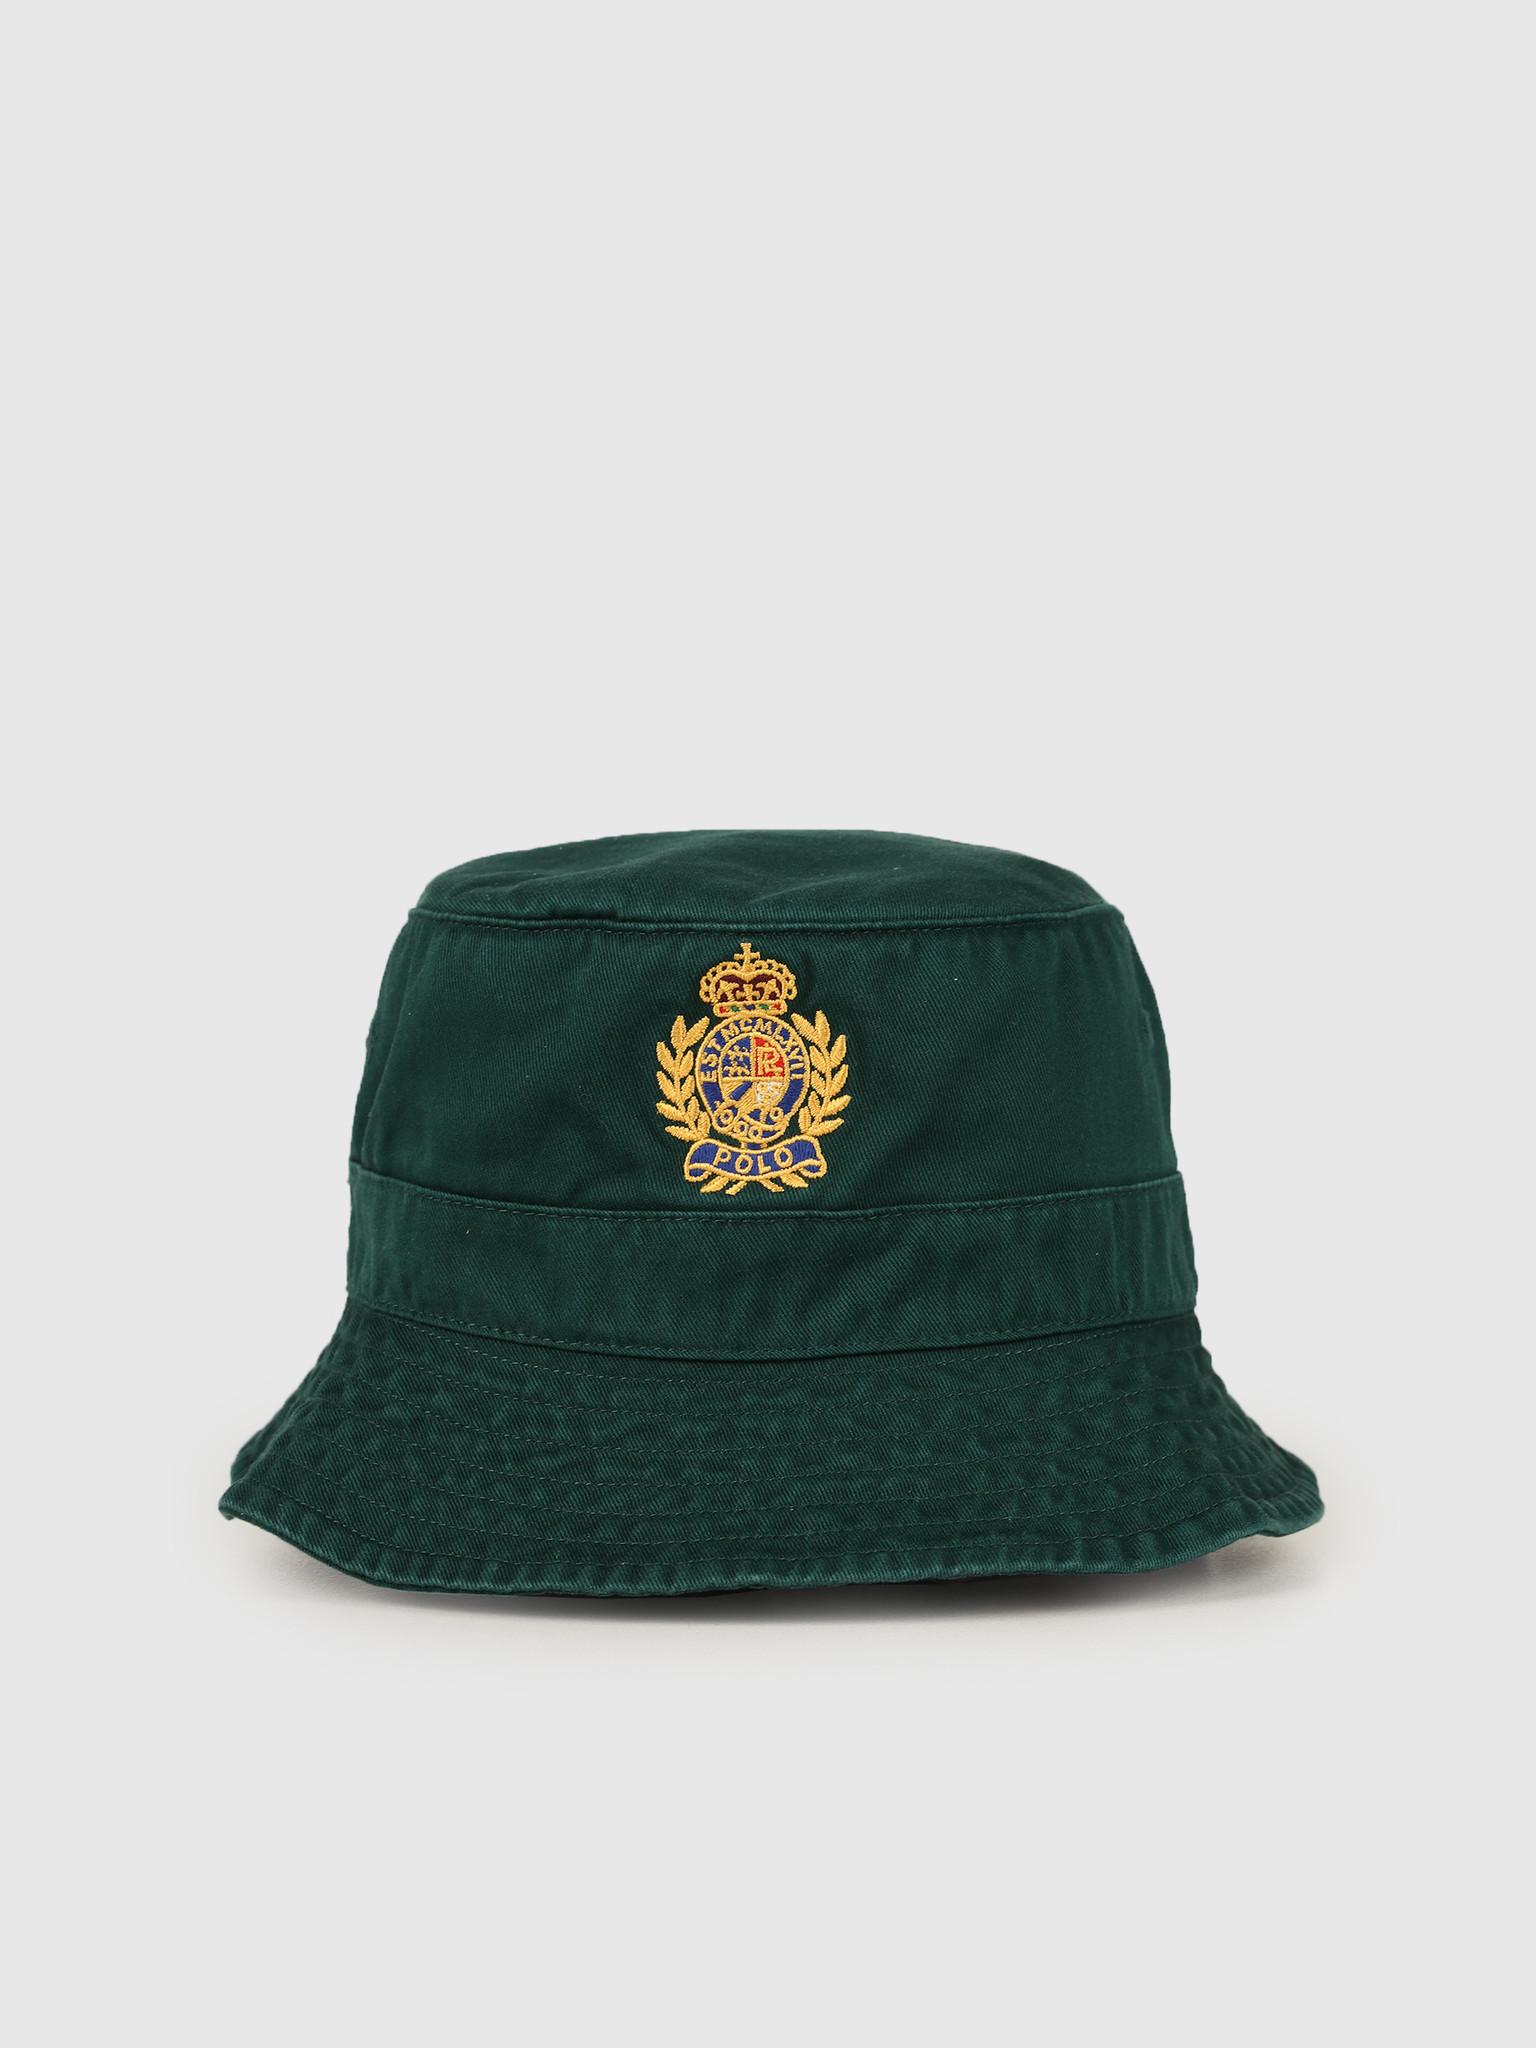 Polo Ralph Lauren Loft Bucket Hat Green 710752314002